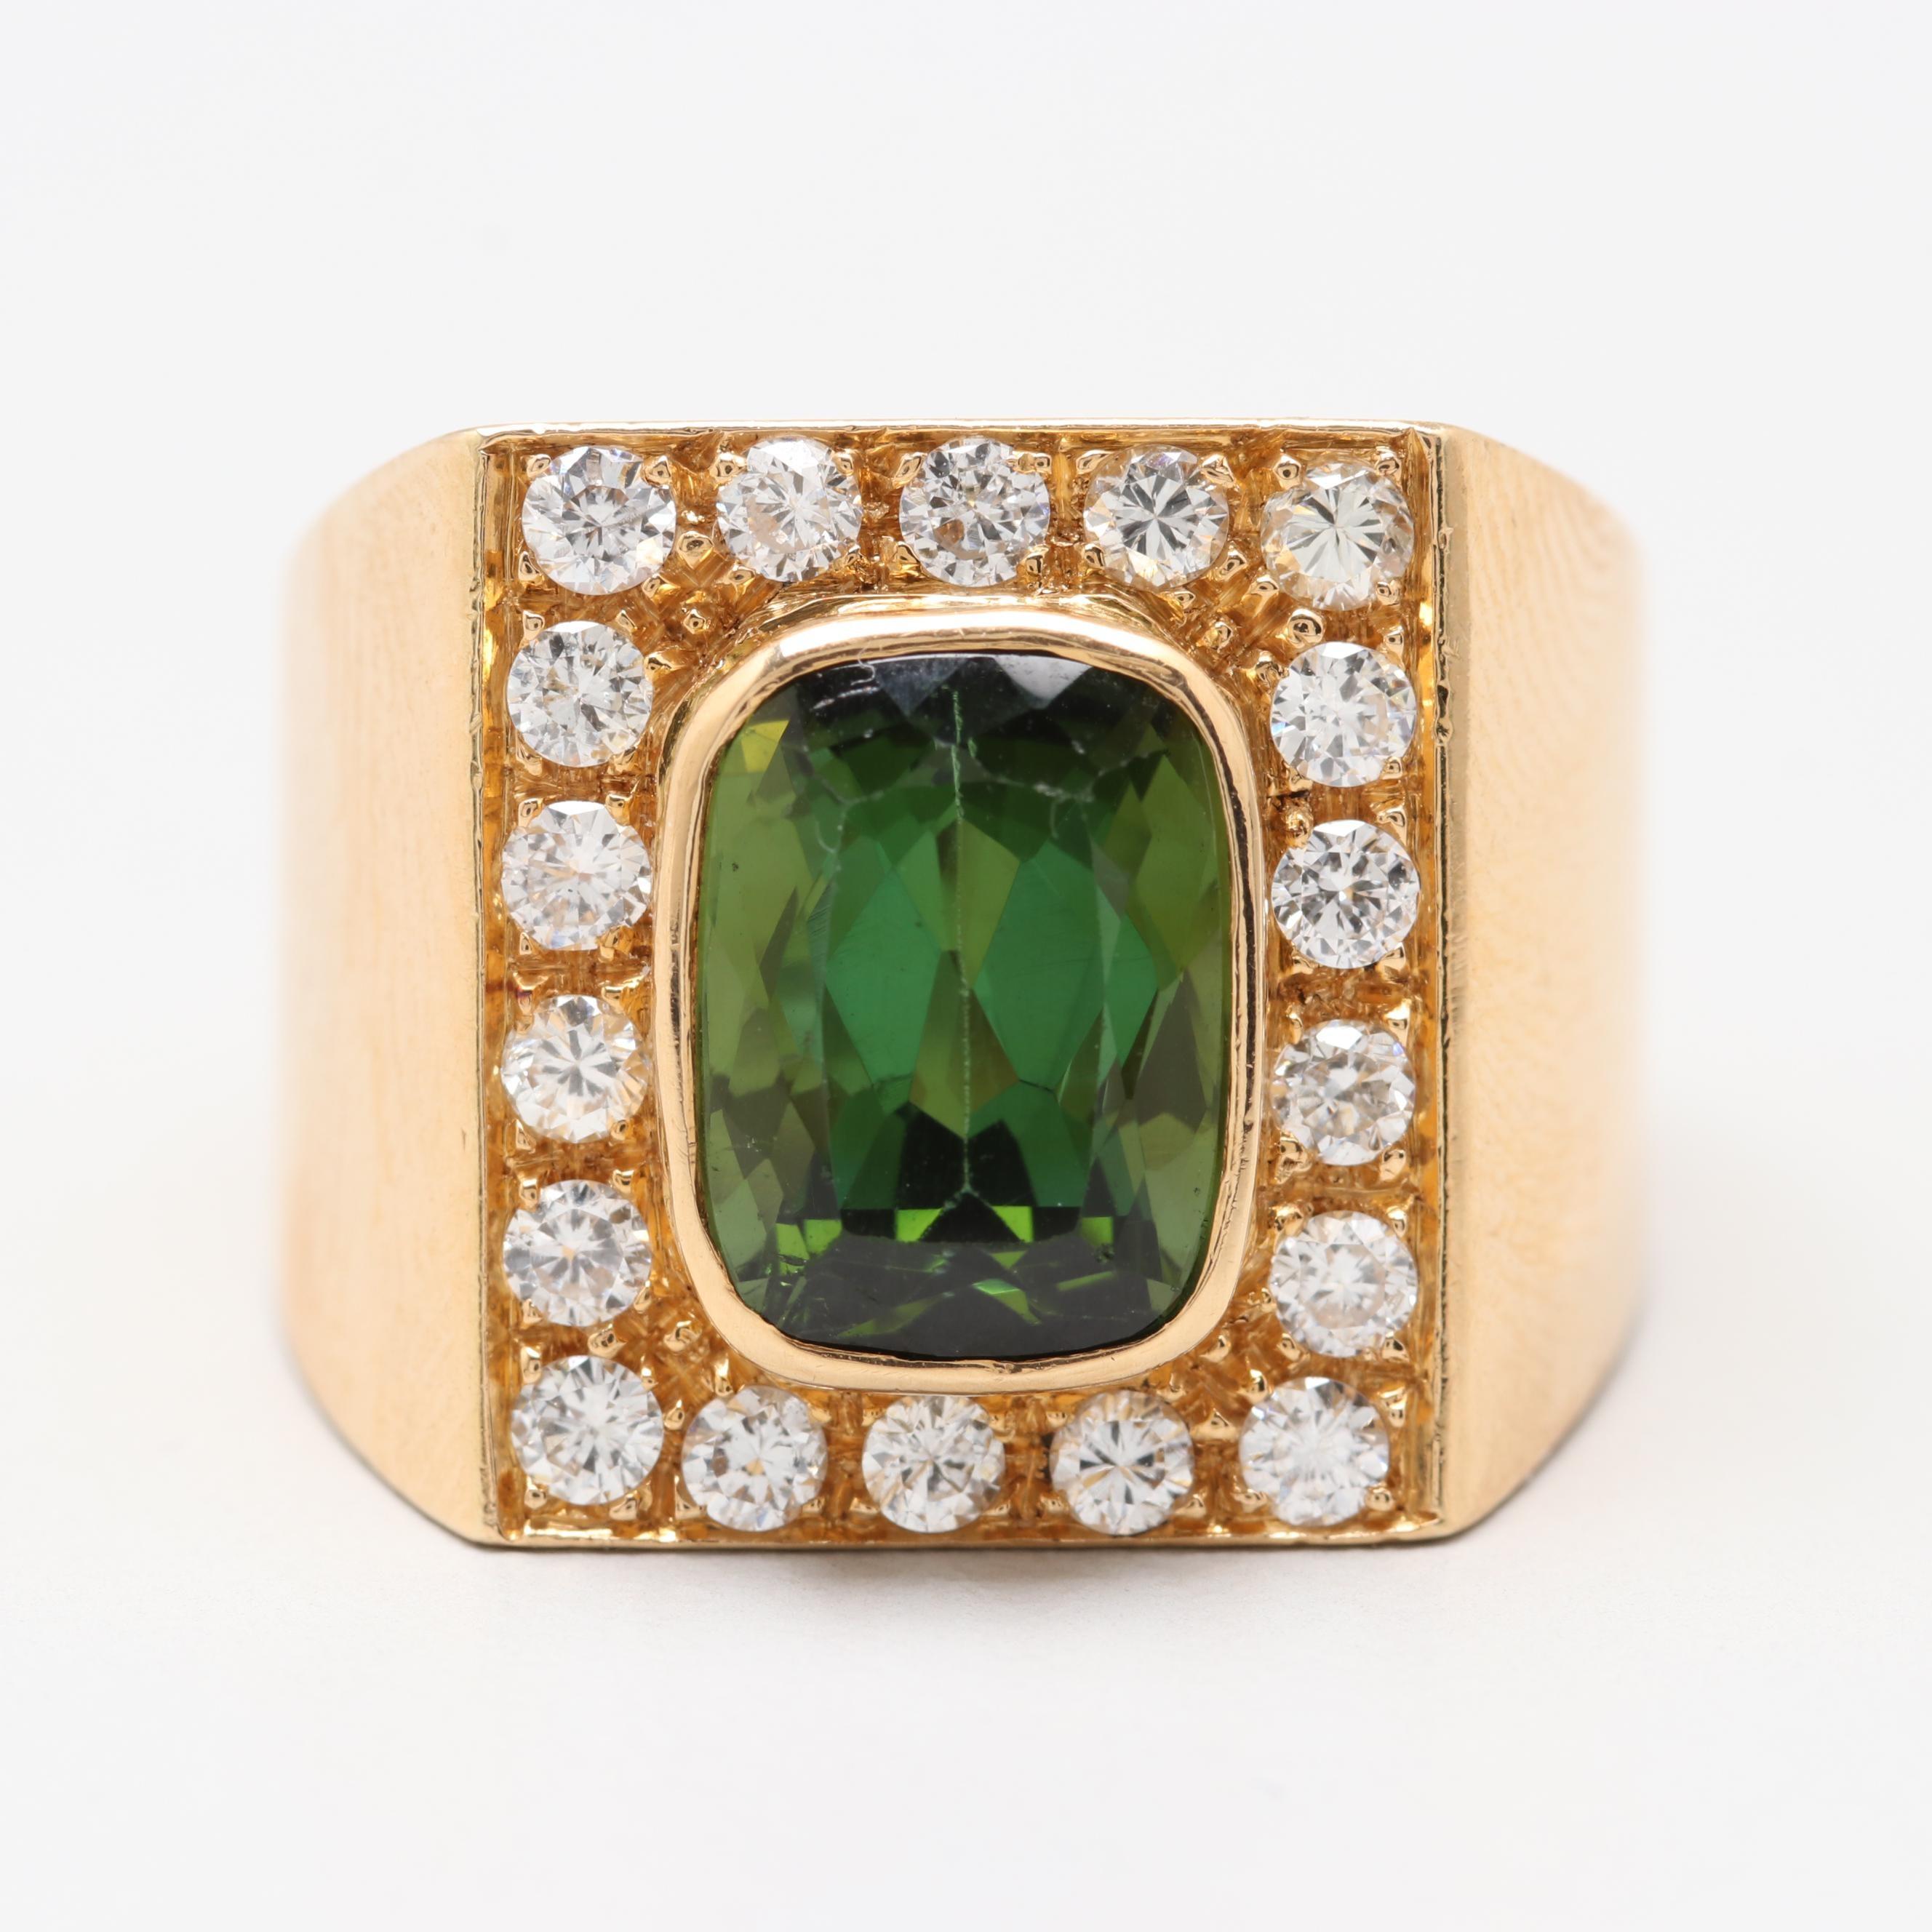 18K Yellow Gold 3.20 CT Green Tourmaline and Diamond Ring